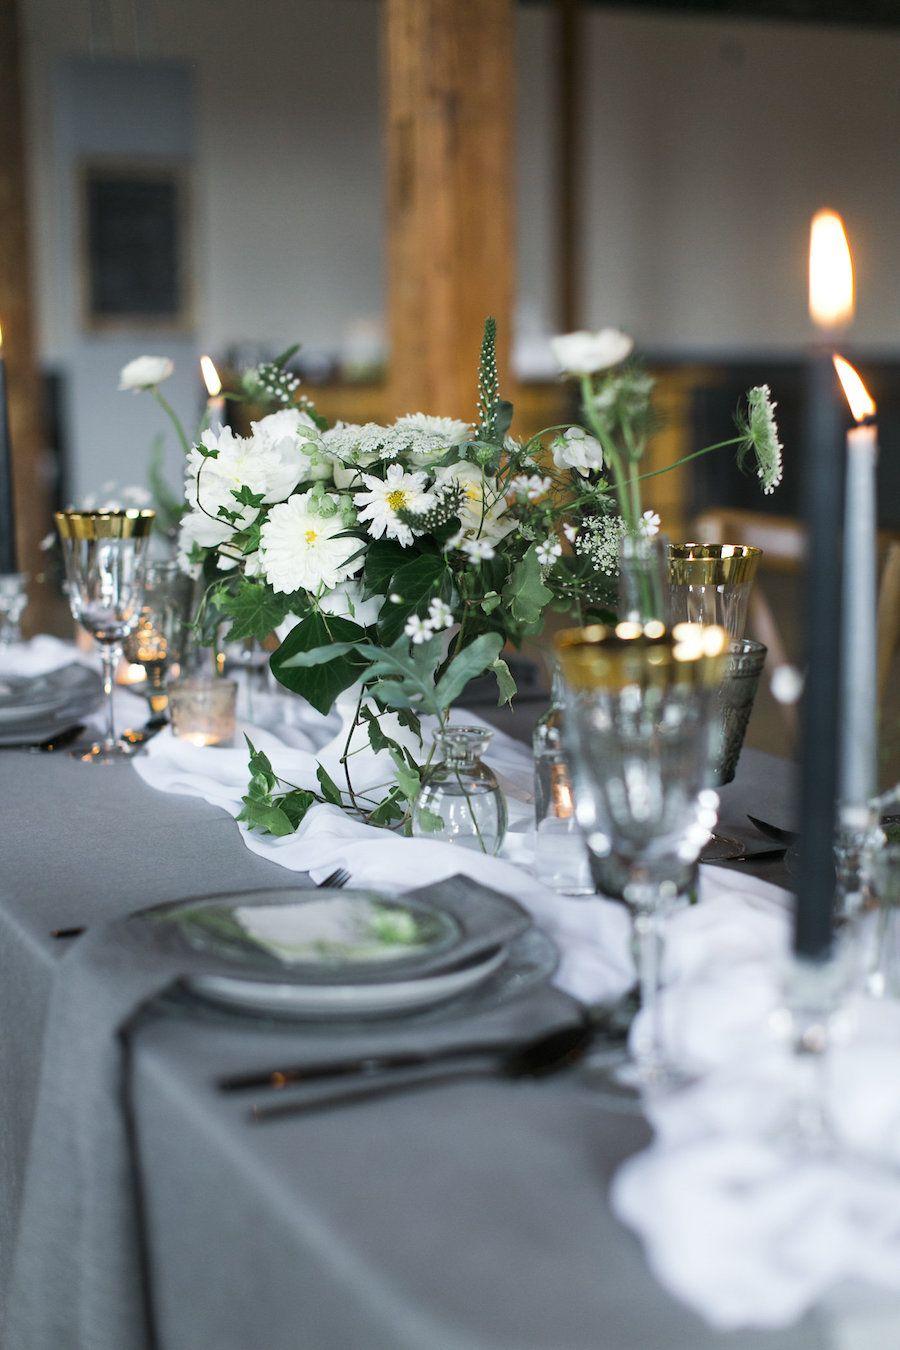 elegant neutral toned toronto wedding inspiration shoot from hello rh pinterest com  wedding table centerpieces ideas on a budget uk